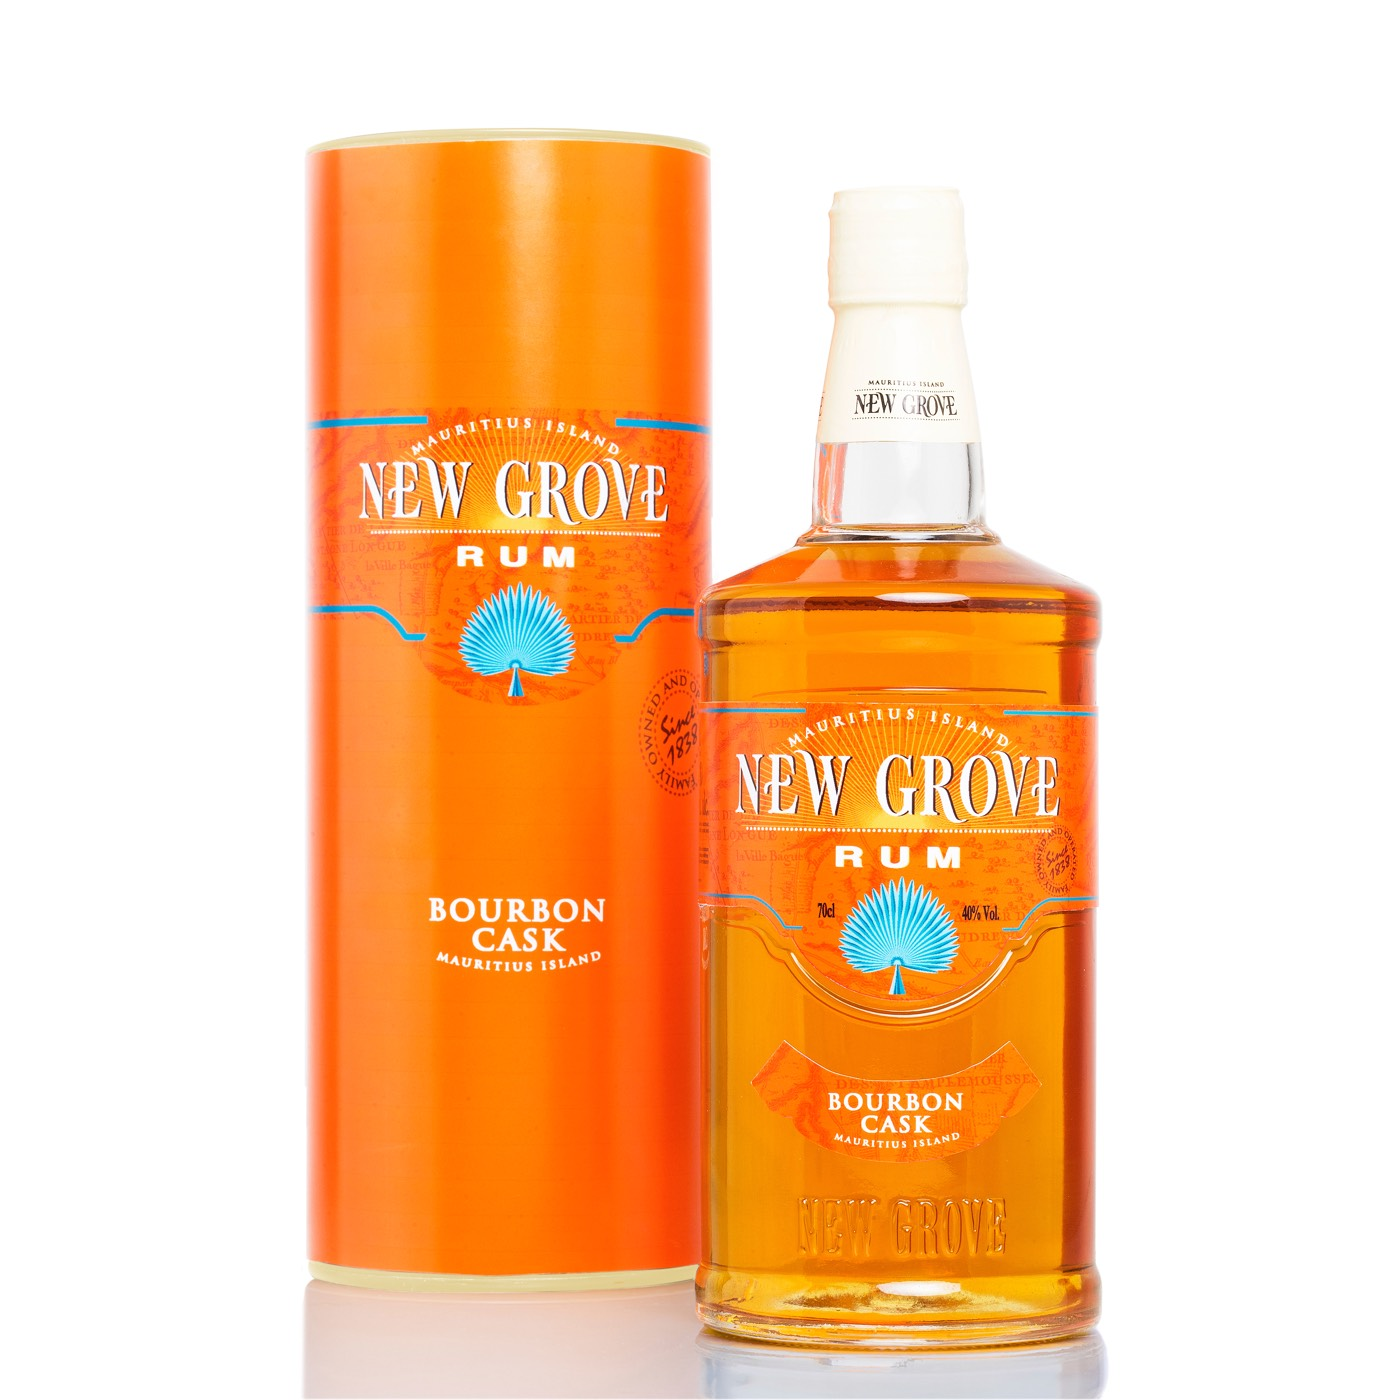 Bottle image of New Grove Bourbon Cask Rum